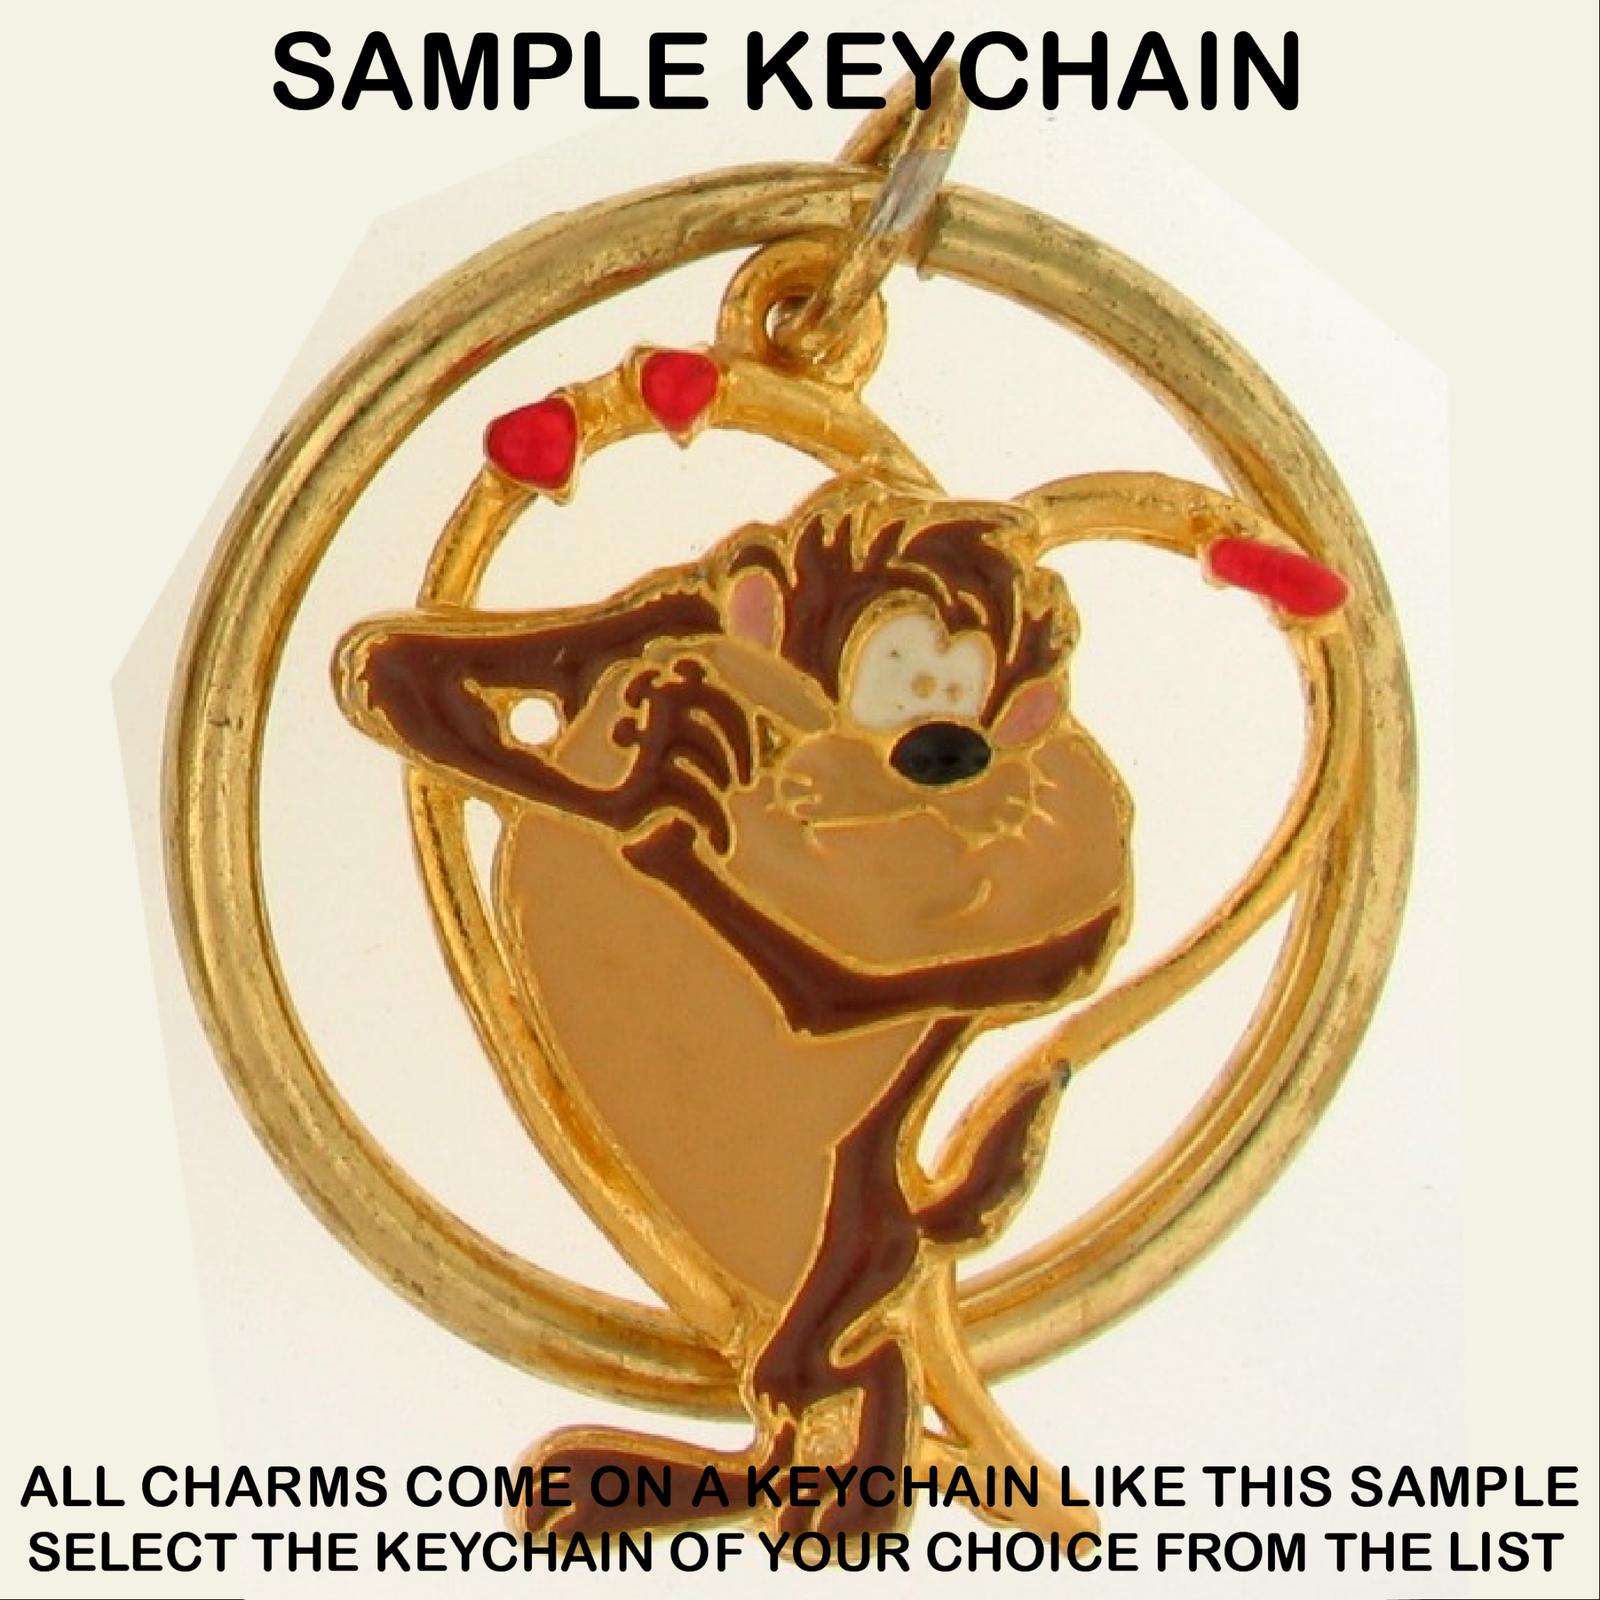 Keychain Taz TASMANIAN Devil LOONEY TUNES Warner Brothers Character Choice 0017w